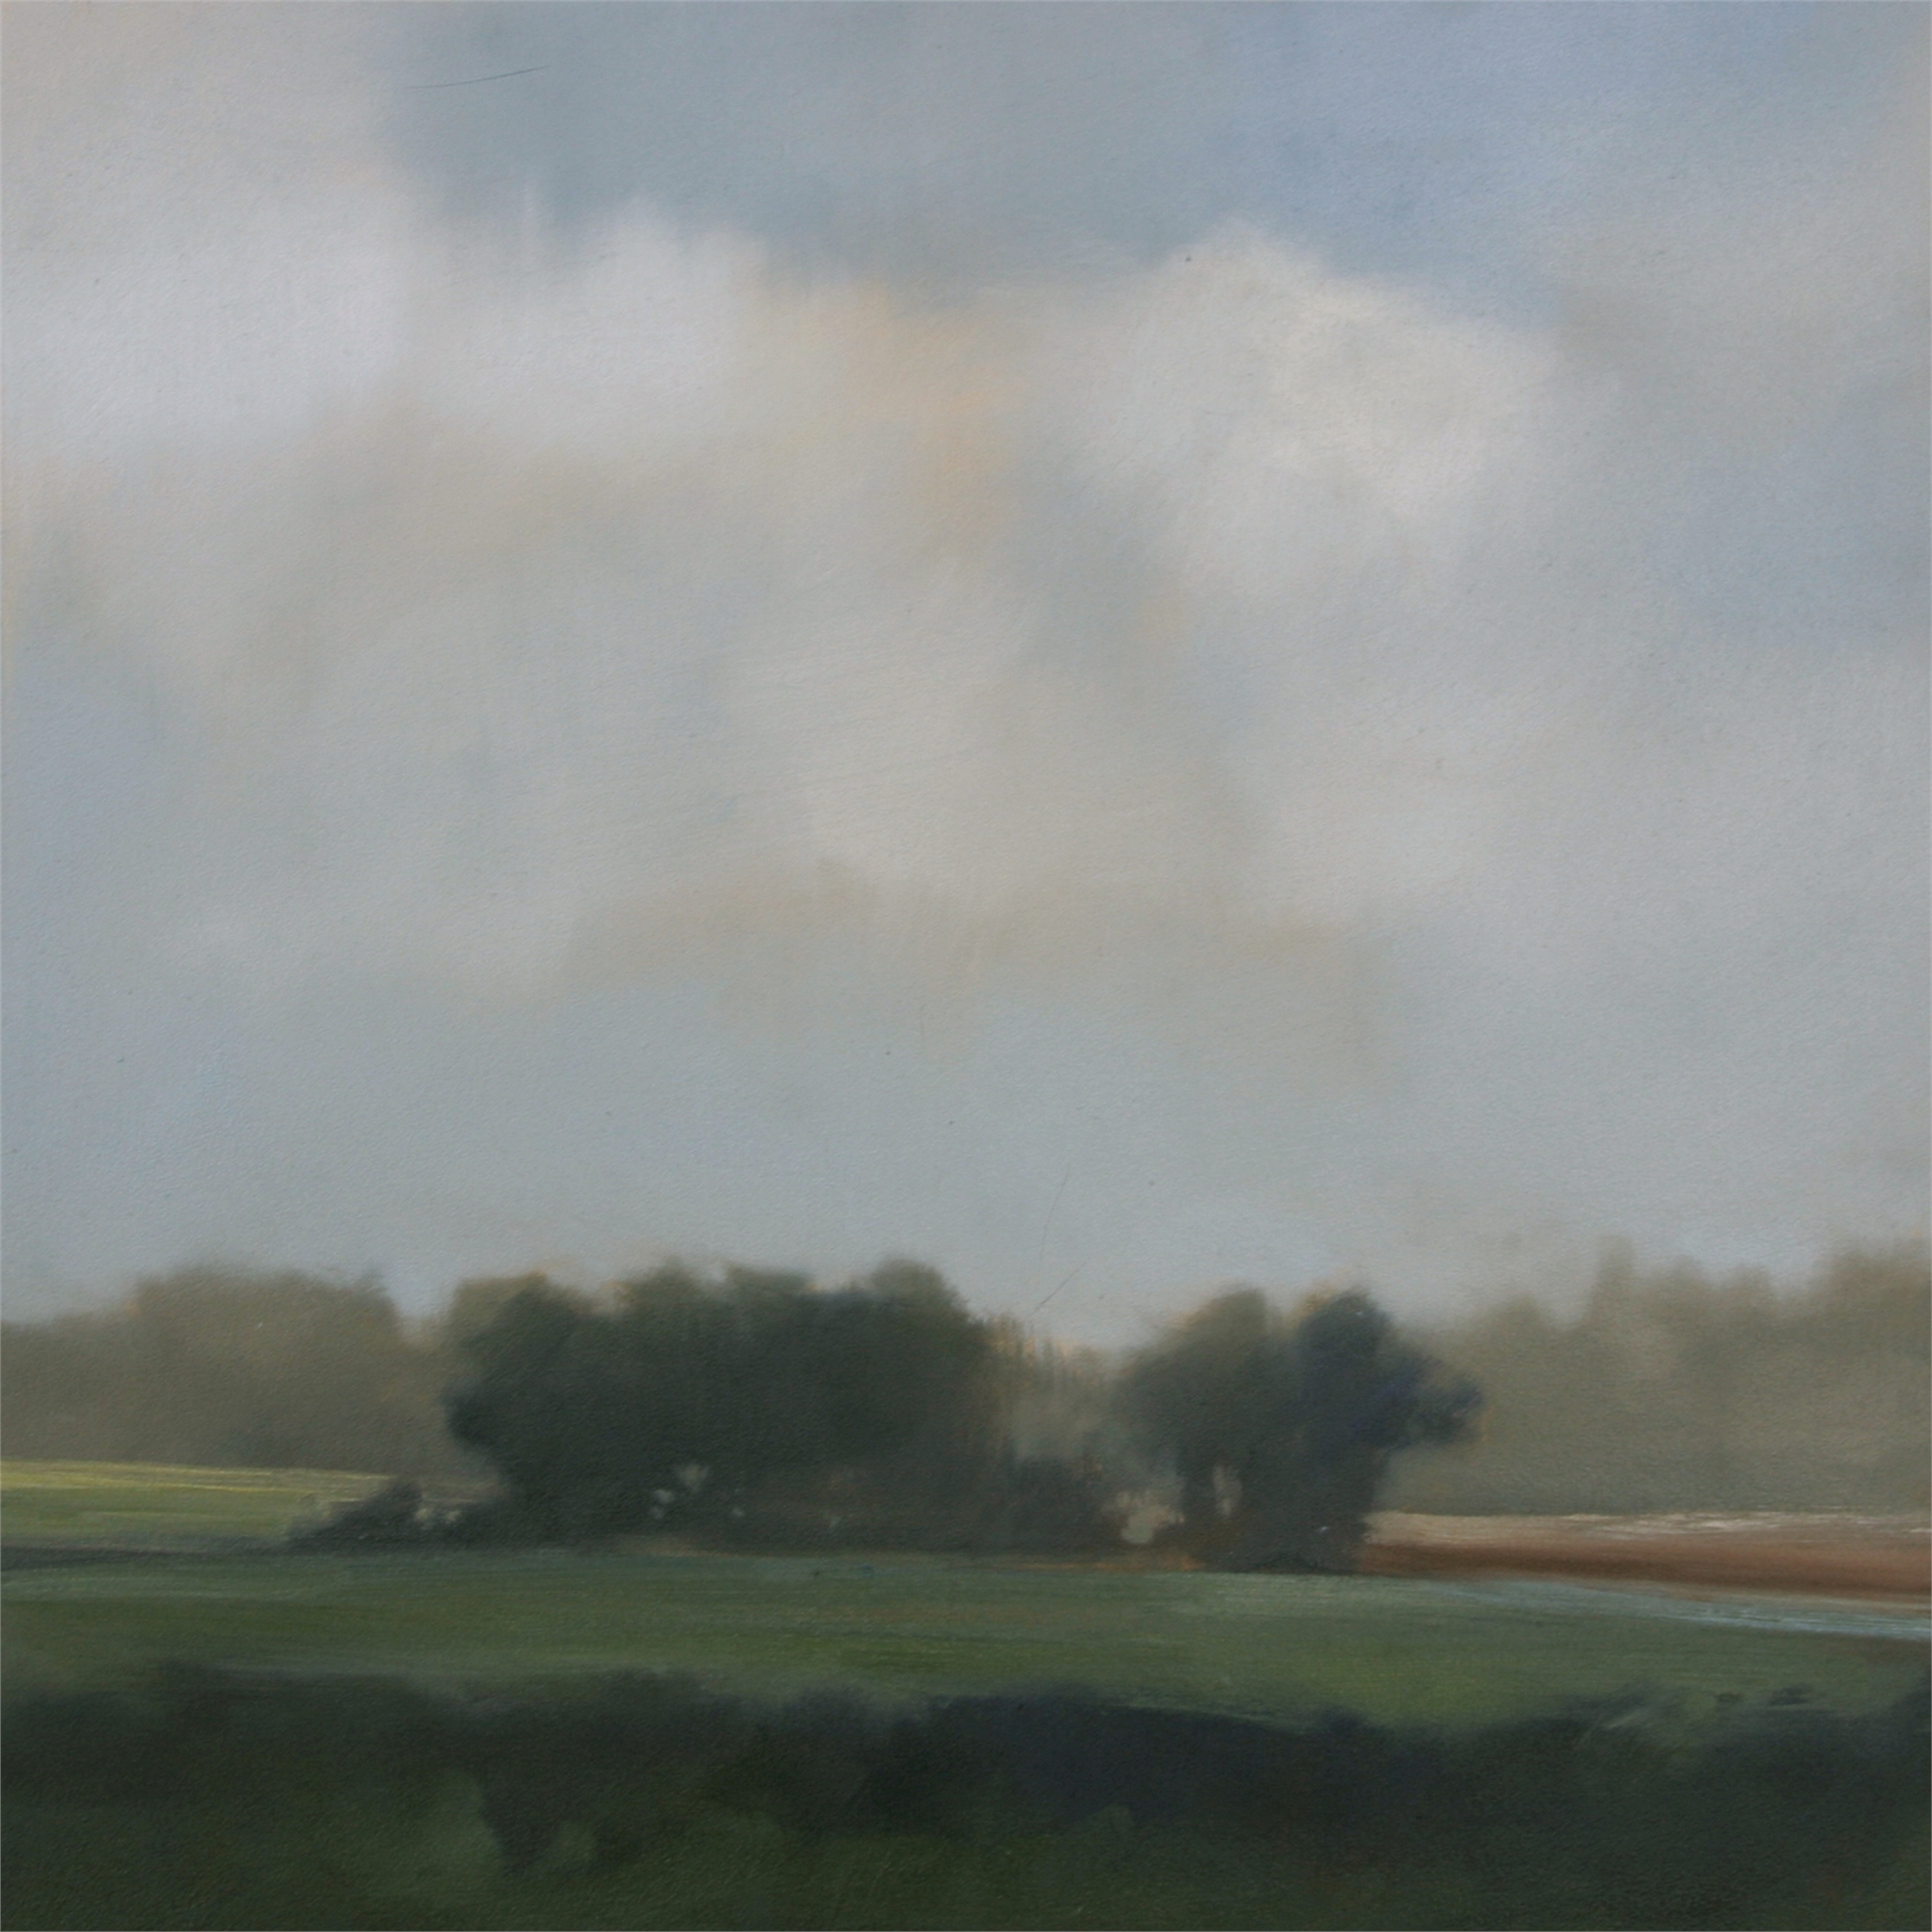 Passing Light Study by Megan Lightell